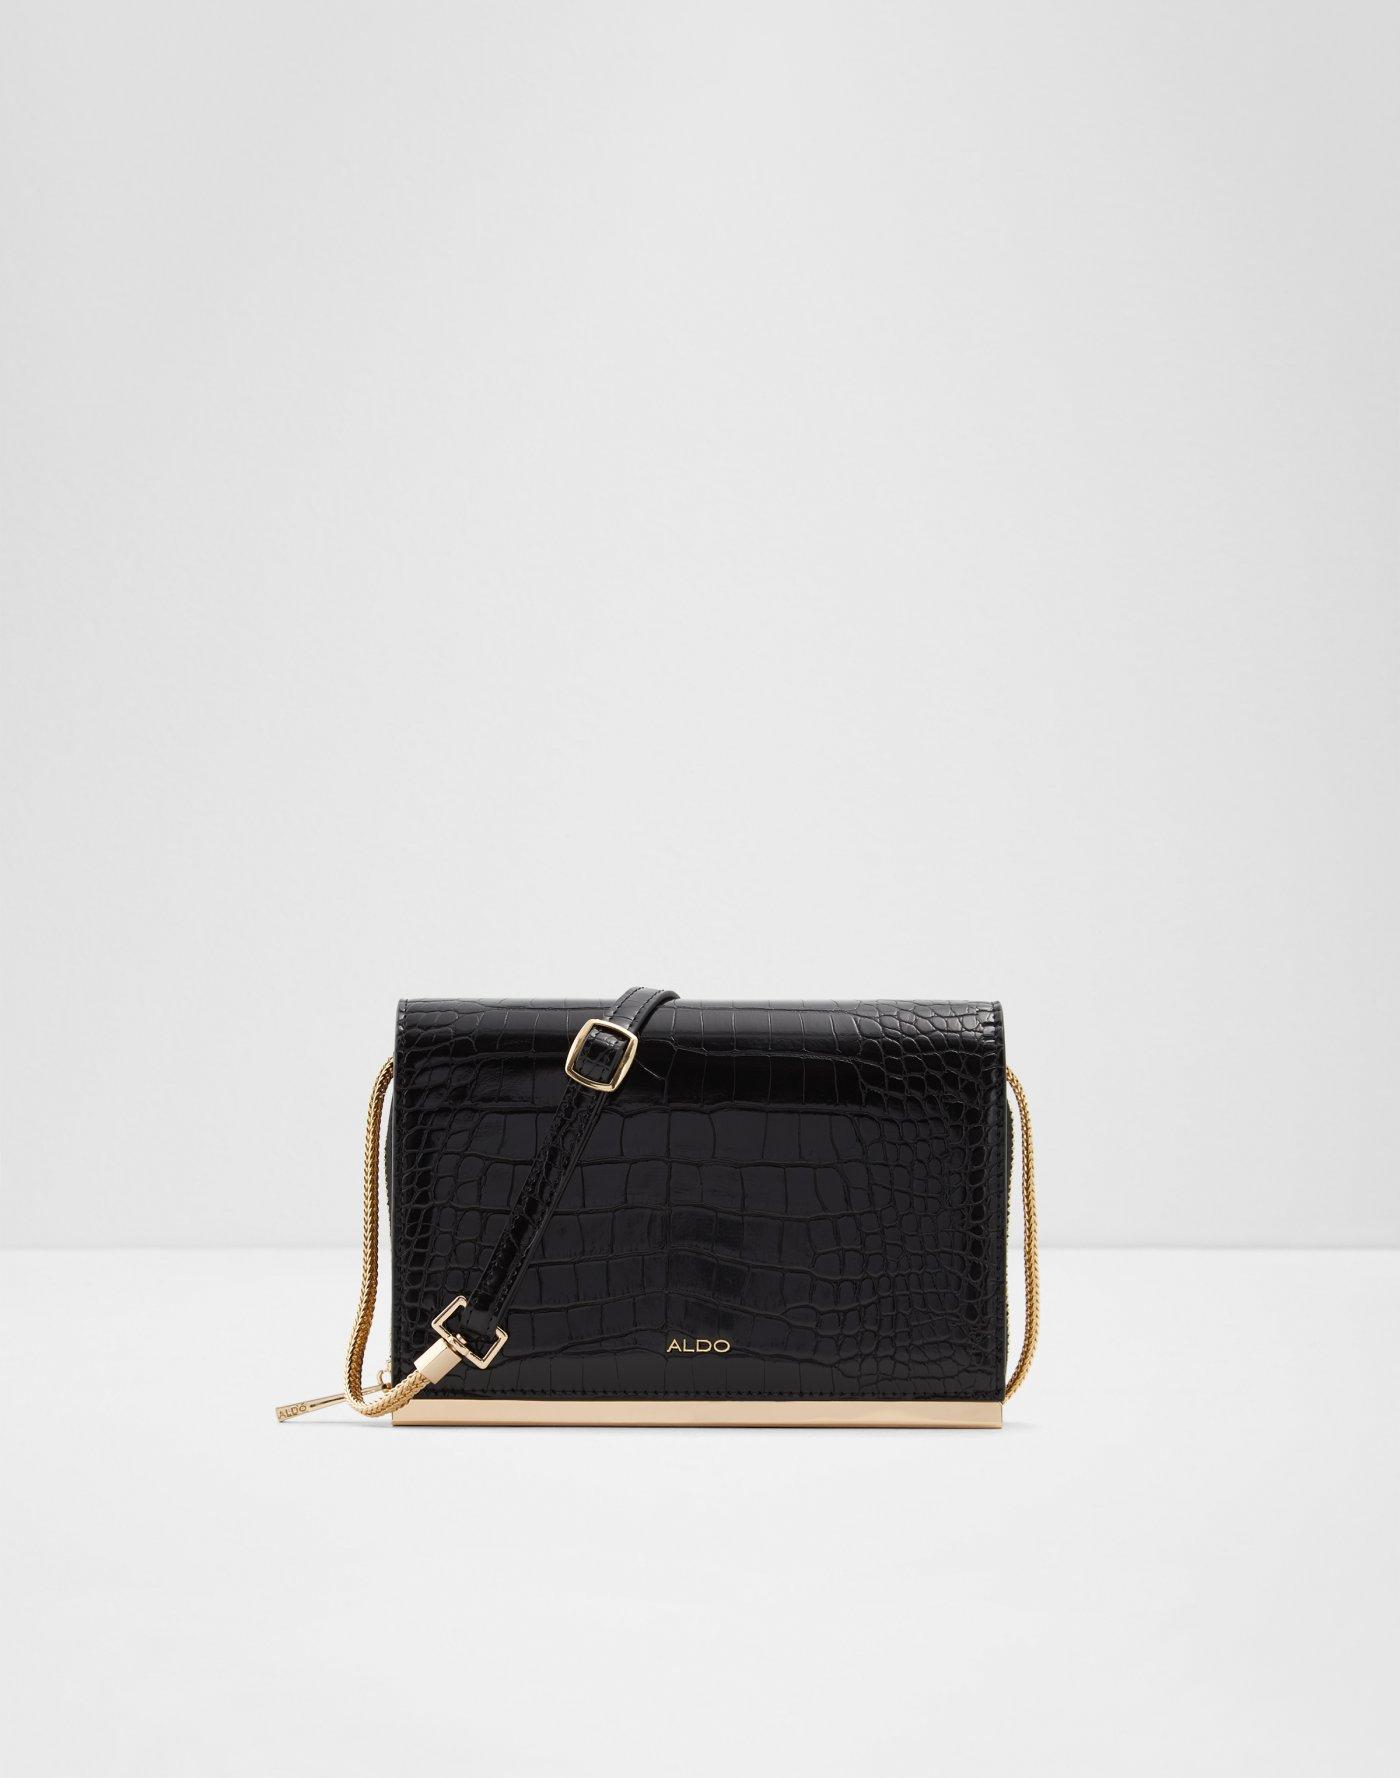 Women's Handbags on Sale | ALDO Canada